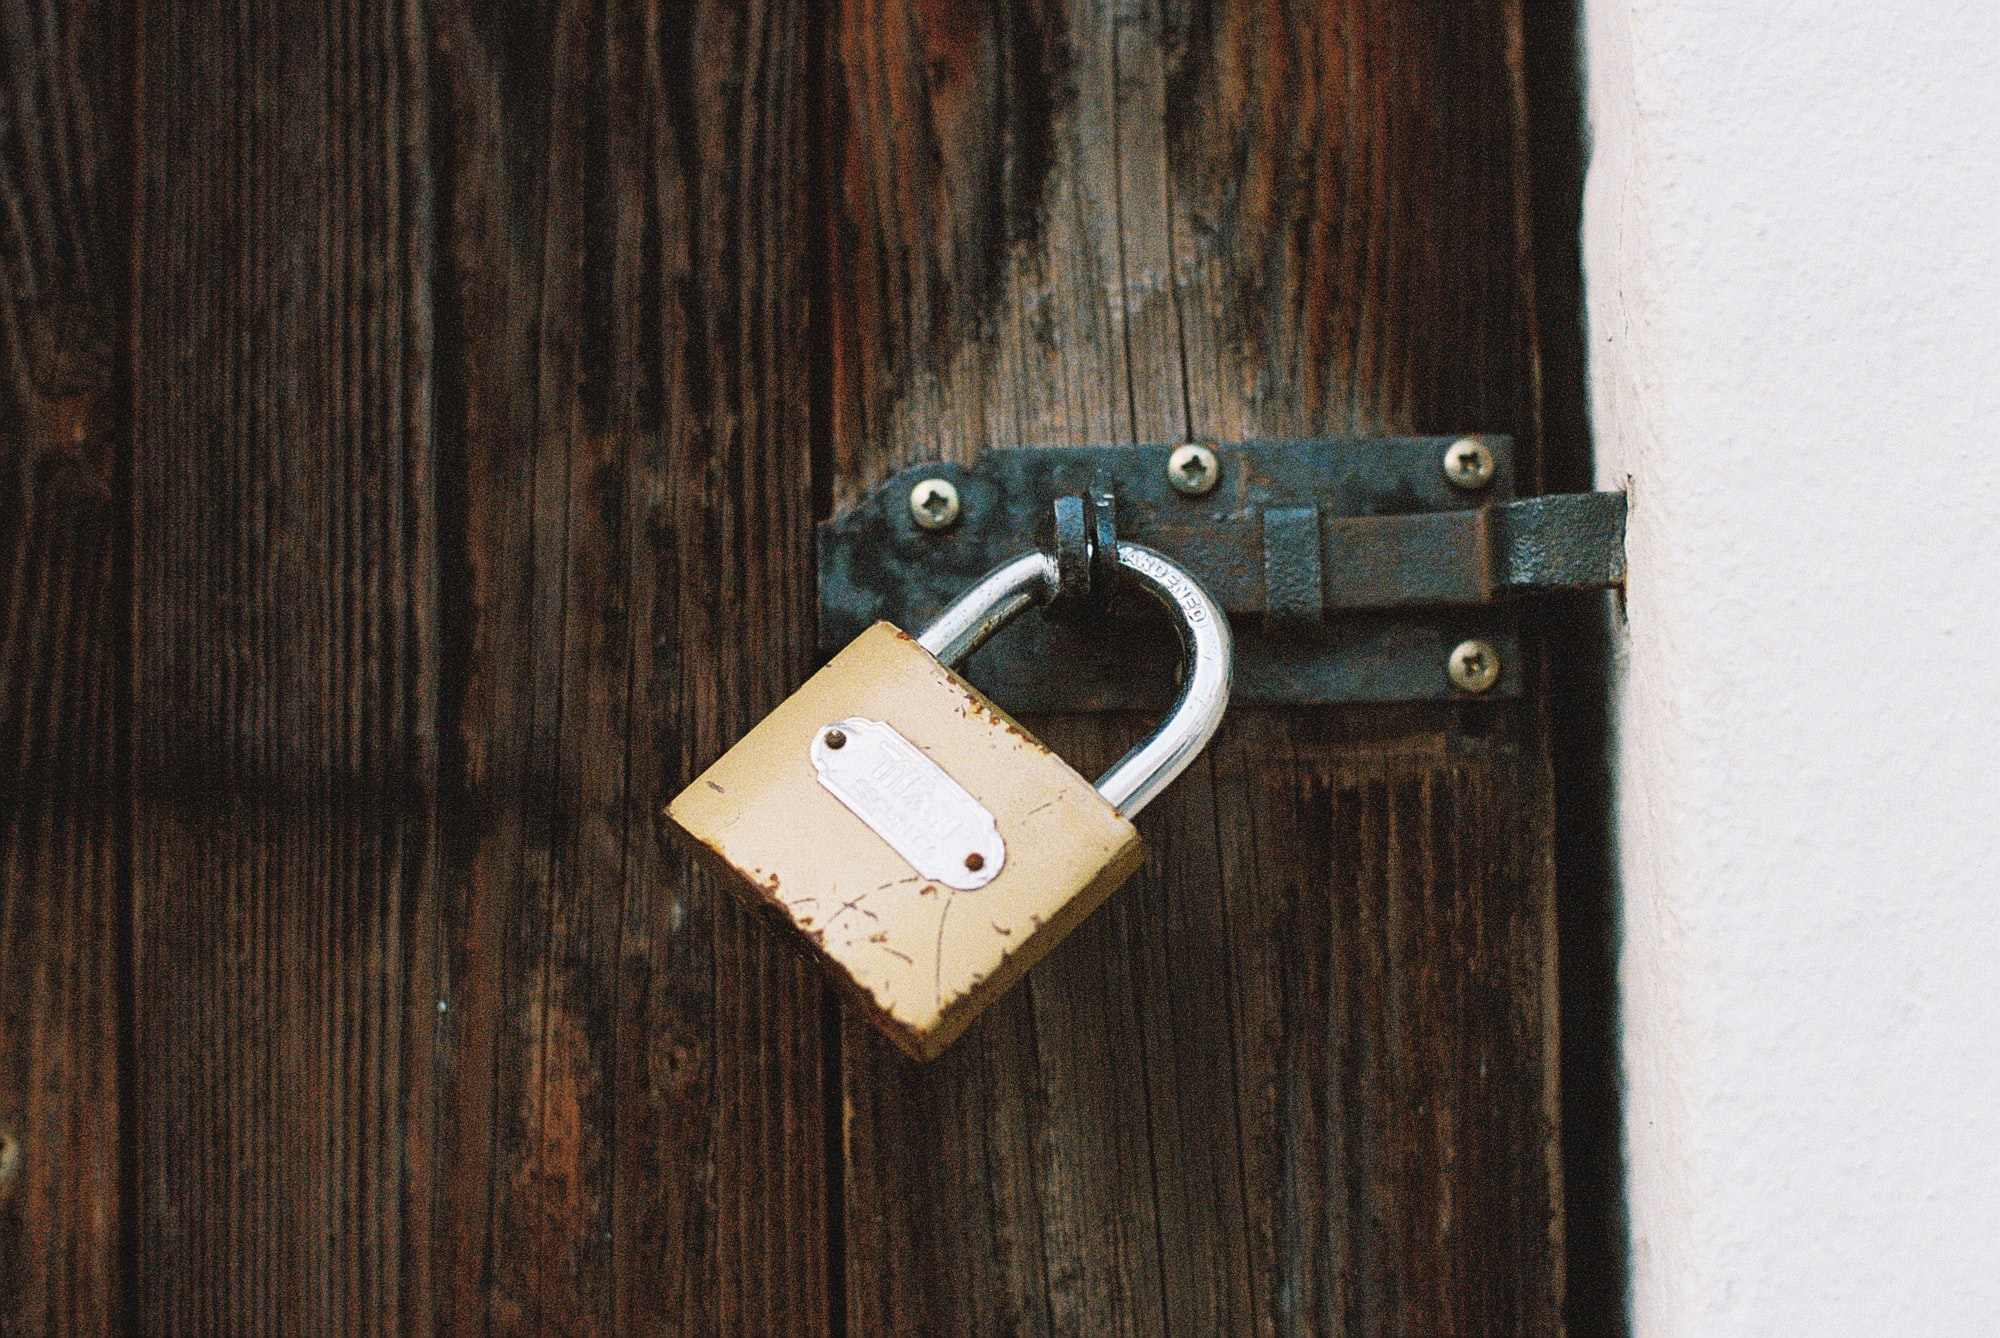 Locked padlock dark wooden weathered door. Made with Leica R7 (Year: 1994) and Leica Summilux-R 1.4 50mm (Year: 1983). Analog scan via nimmfilm.de: Fuji Frontier SP-3000. Film reel: Kodak Portra 800